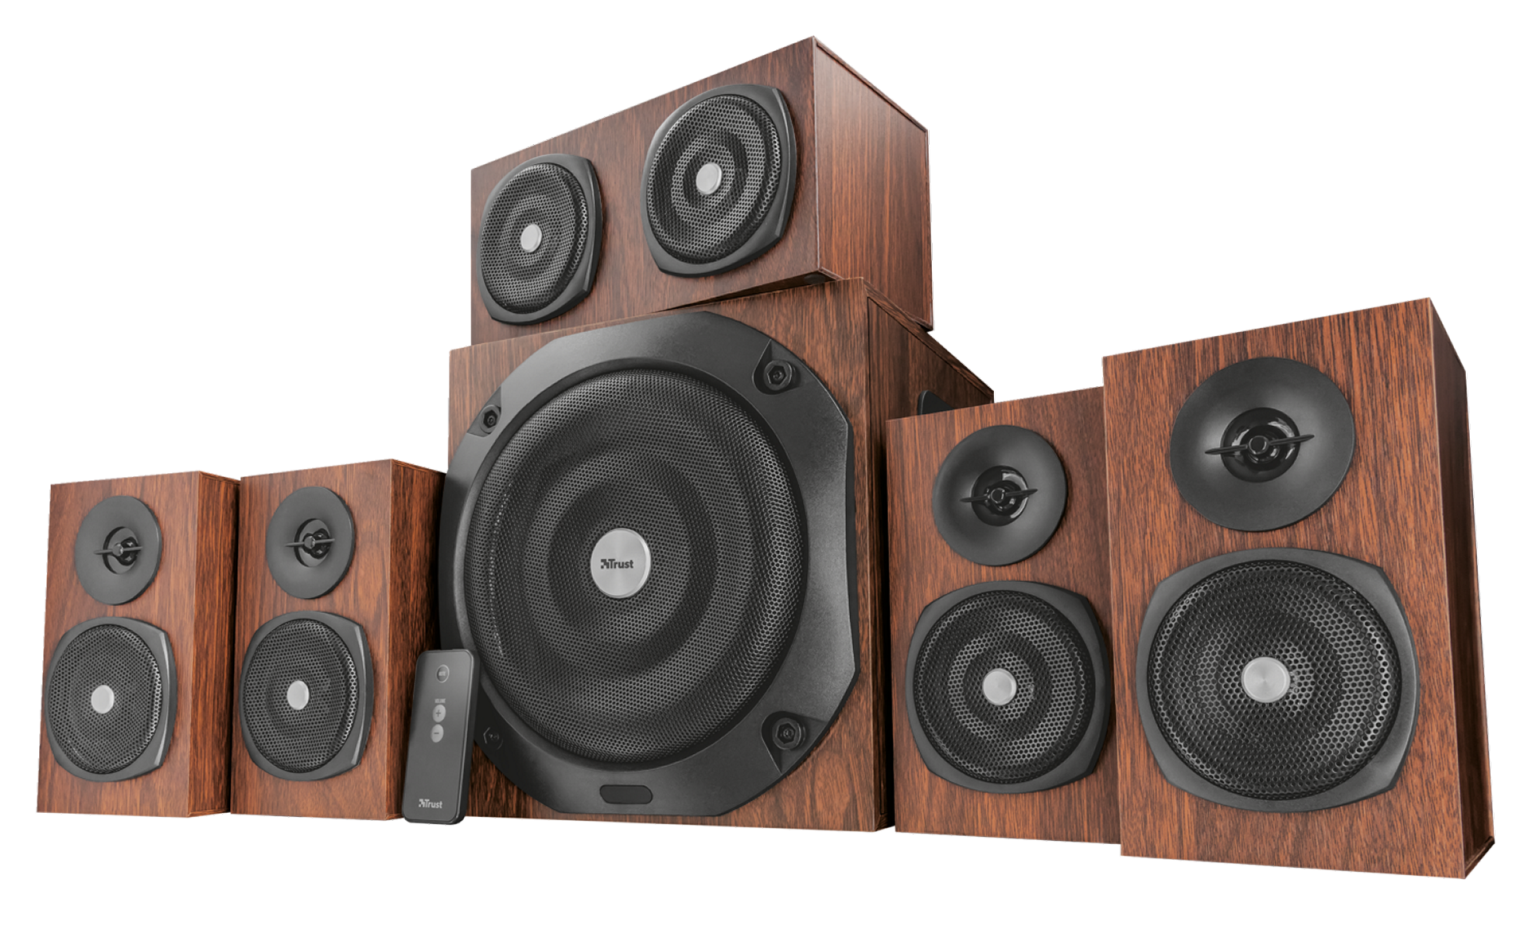 zvuk. systém TRUST Vigor 5.1 Surround Speaker System for pc - brown